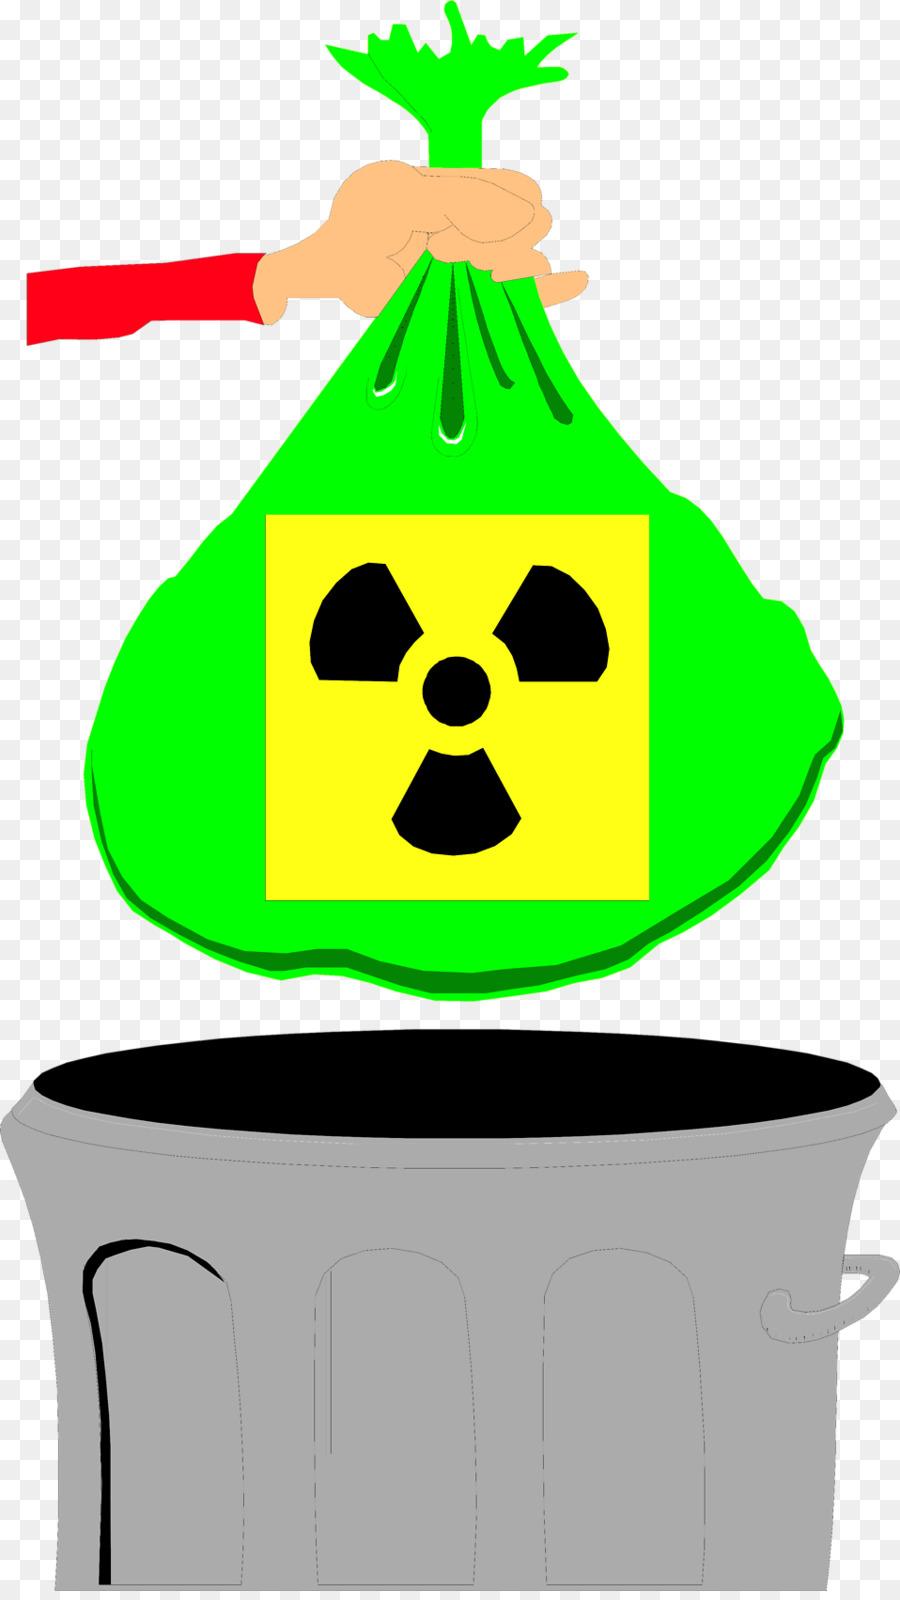 Hazardous Waste Toxic Waste Clip Art Hazardous Waste Cliparts Png